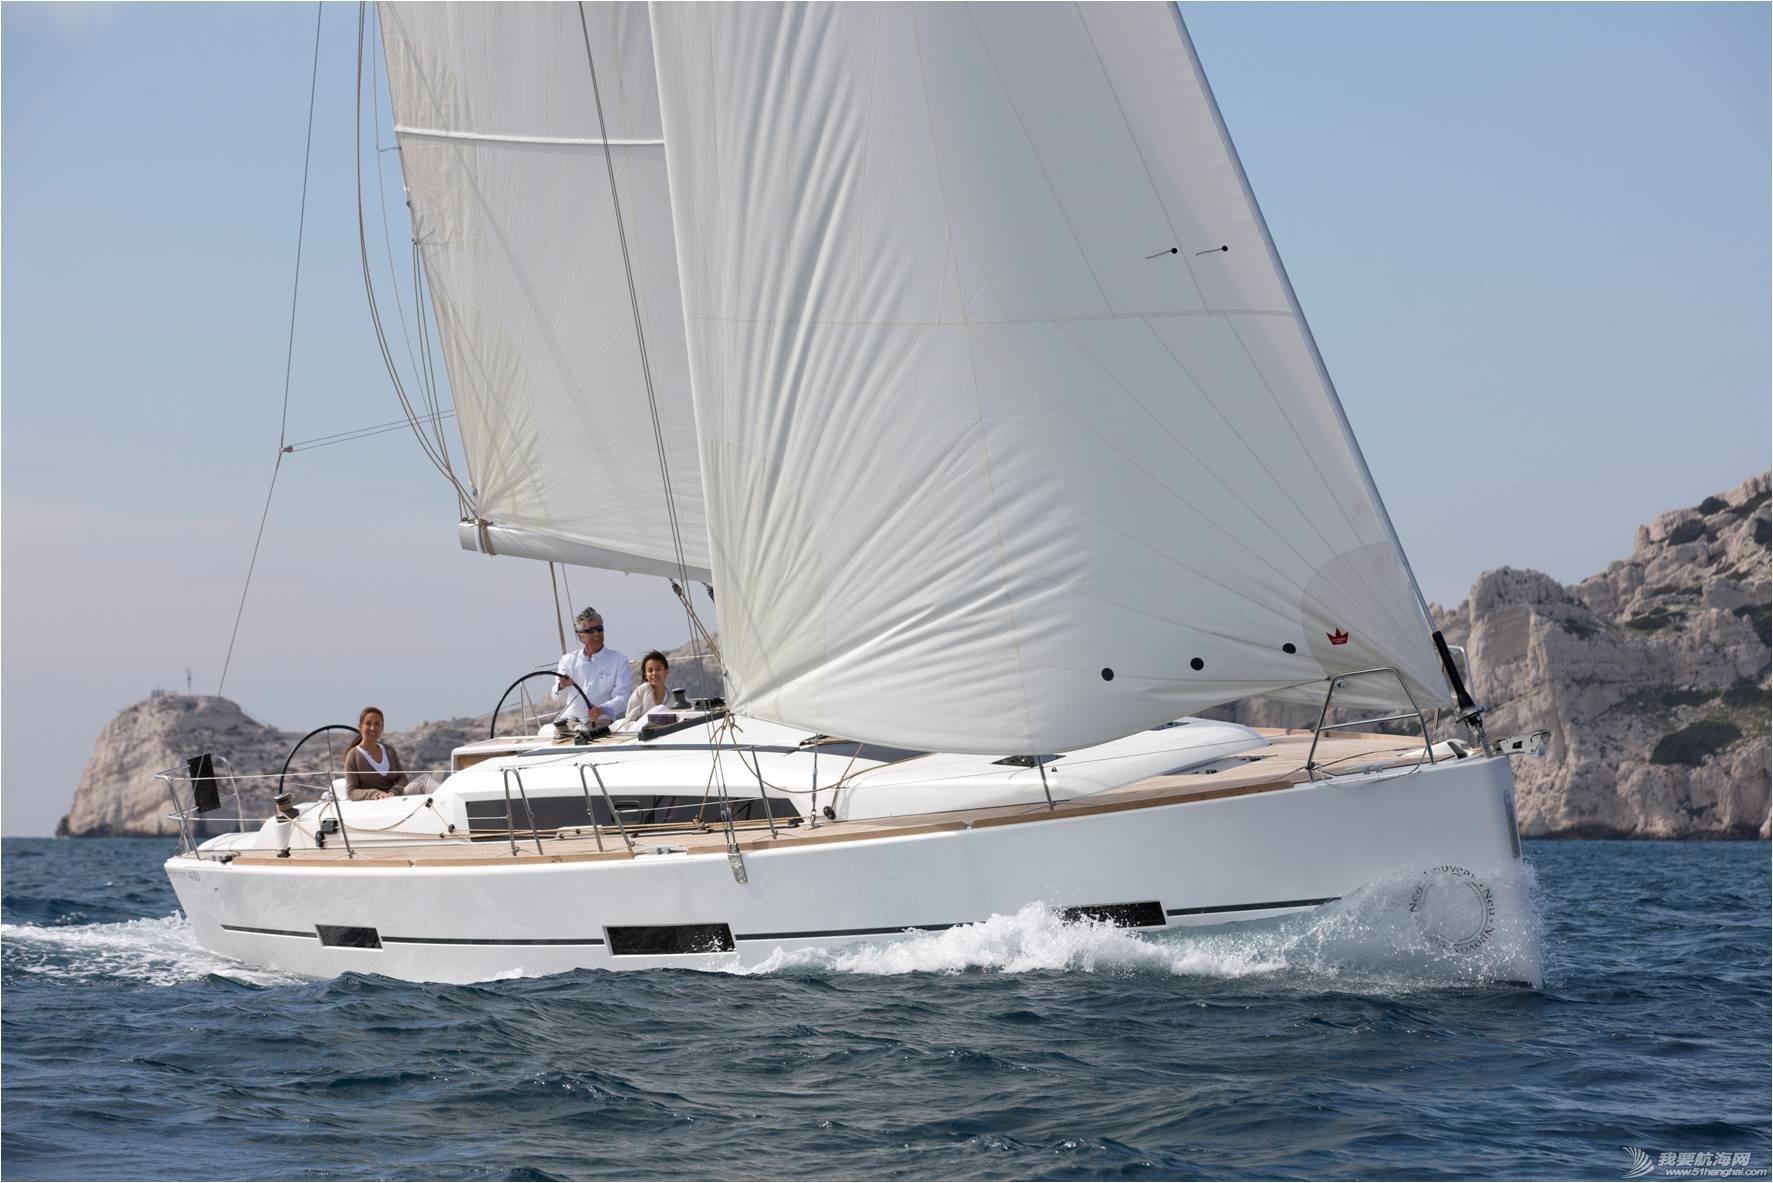 法国,我们,大连,出港,DUFOUR410 大连:法国DUFOUR410帆船艇-现船  161353twtpgp1x7g3qsdnt